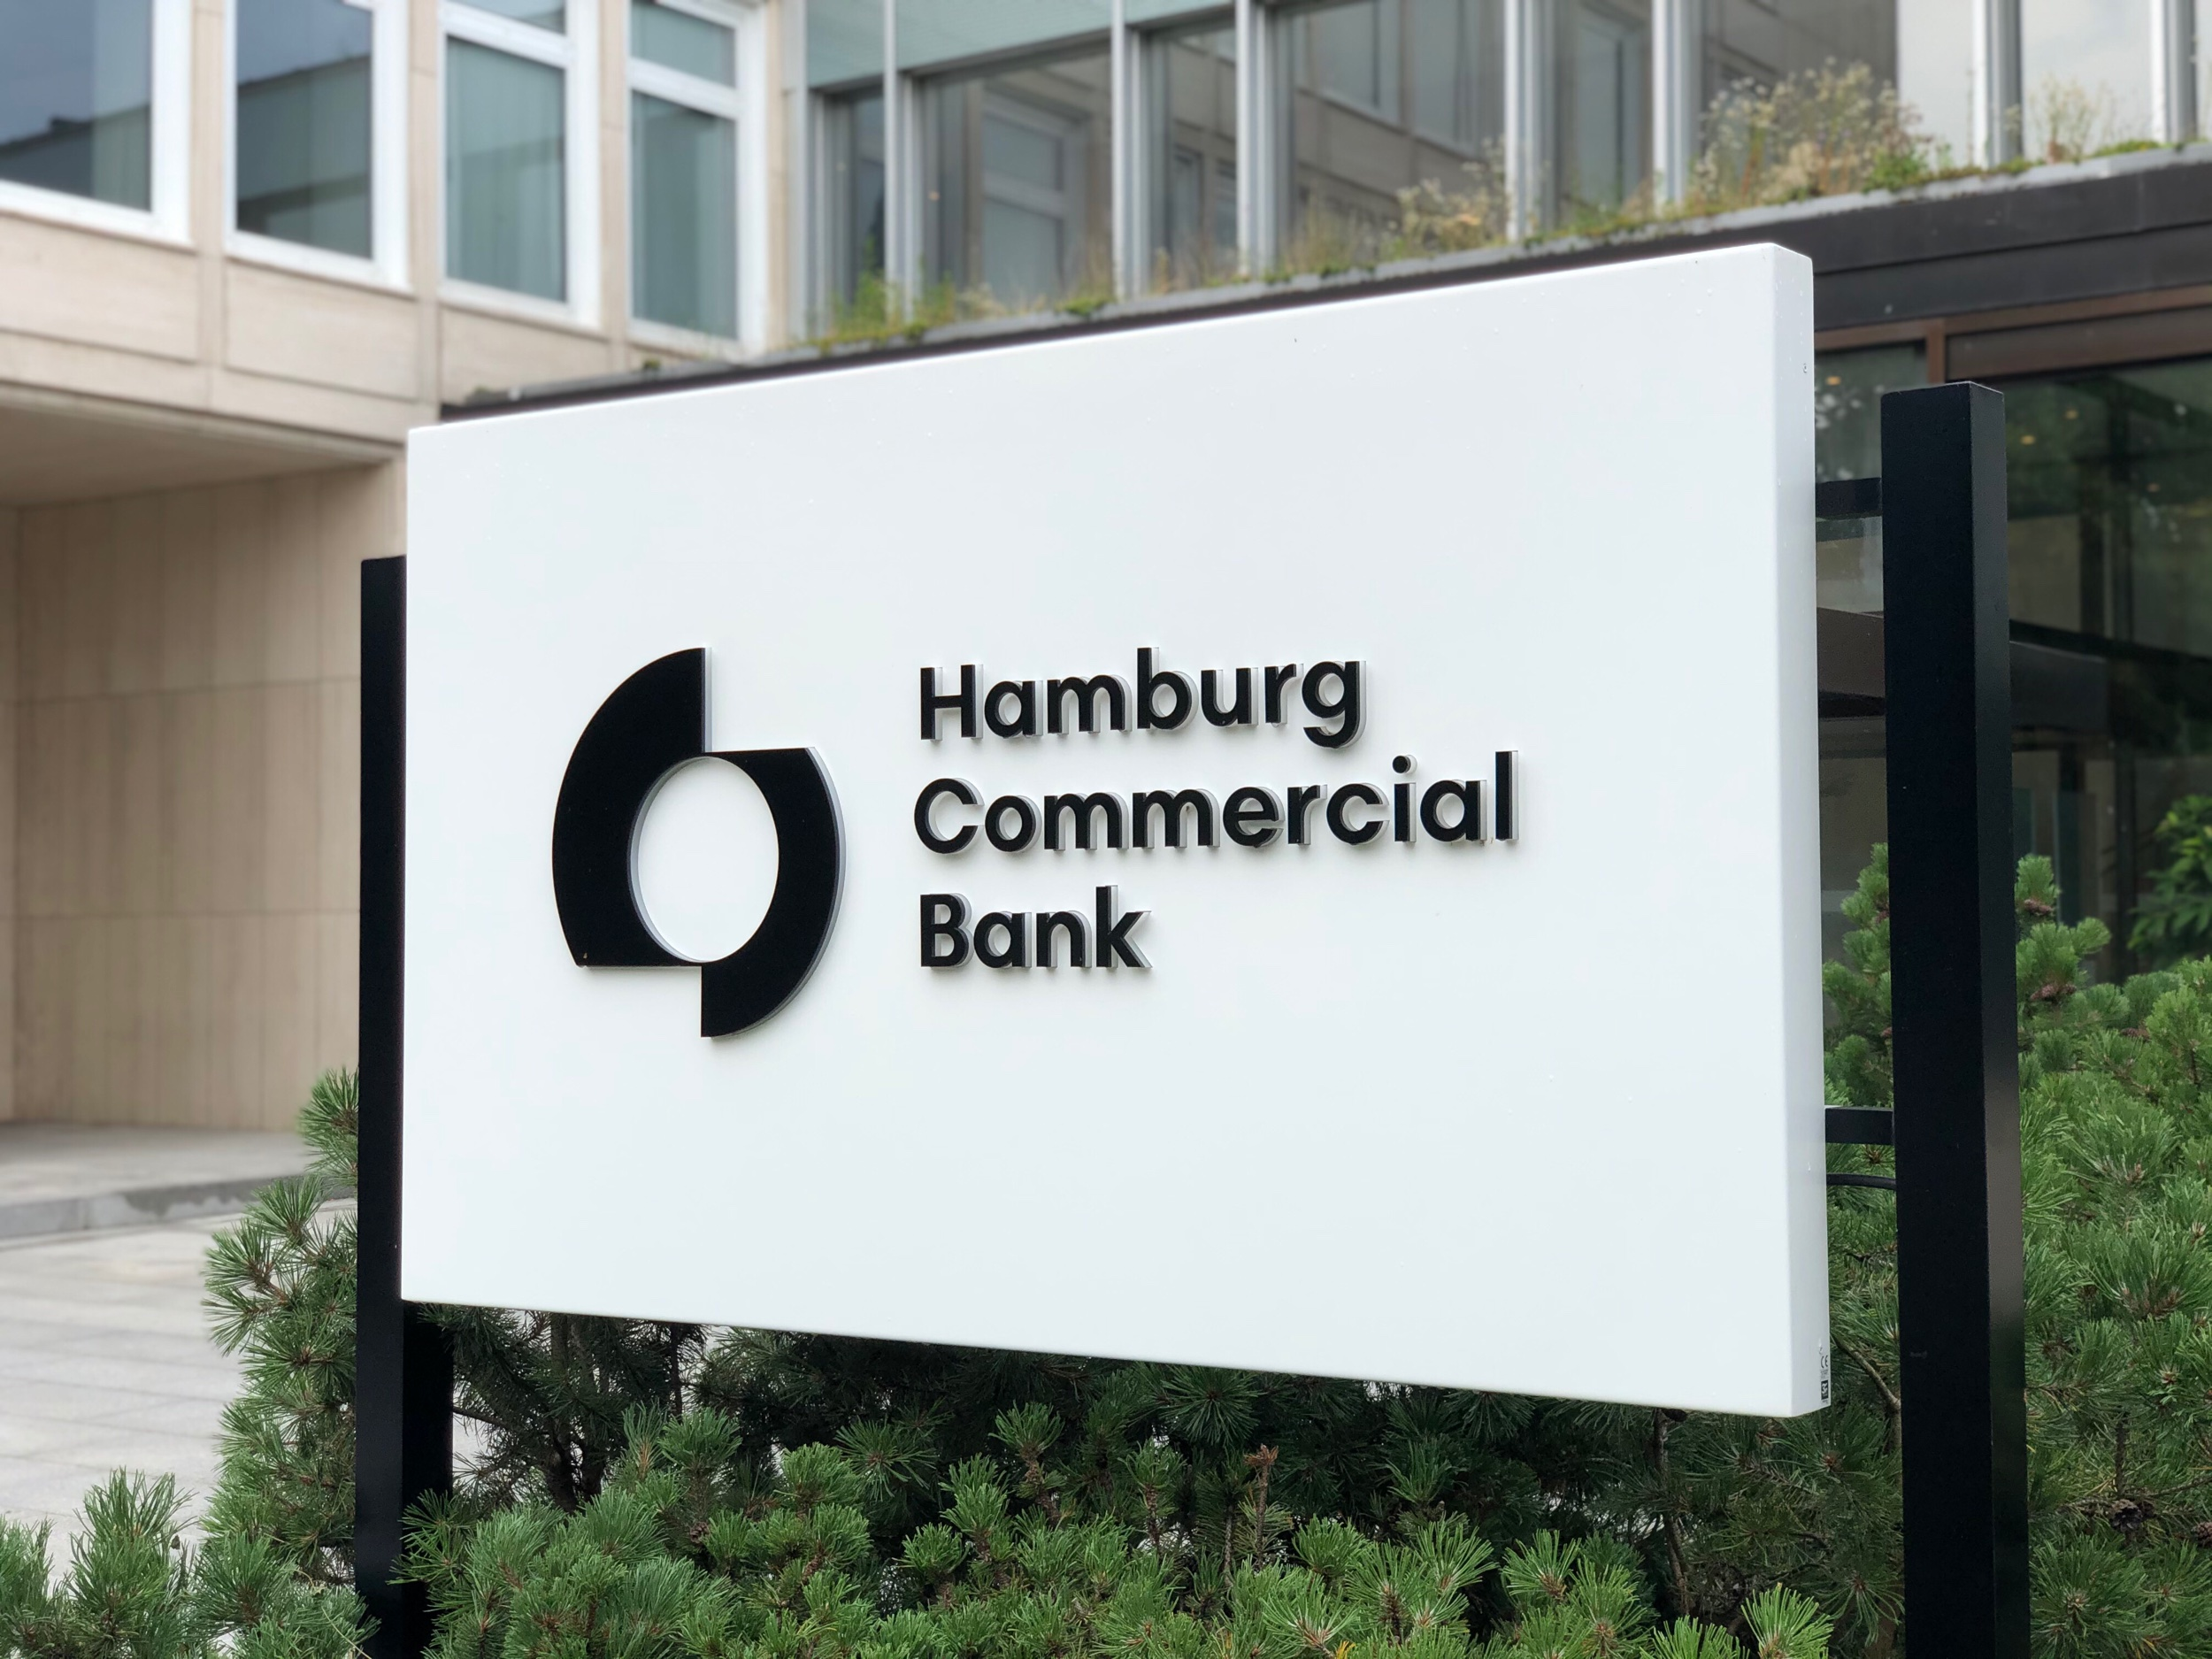 - Hamburg Commercial Bank